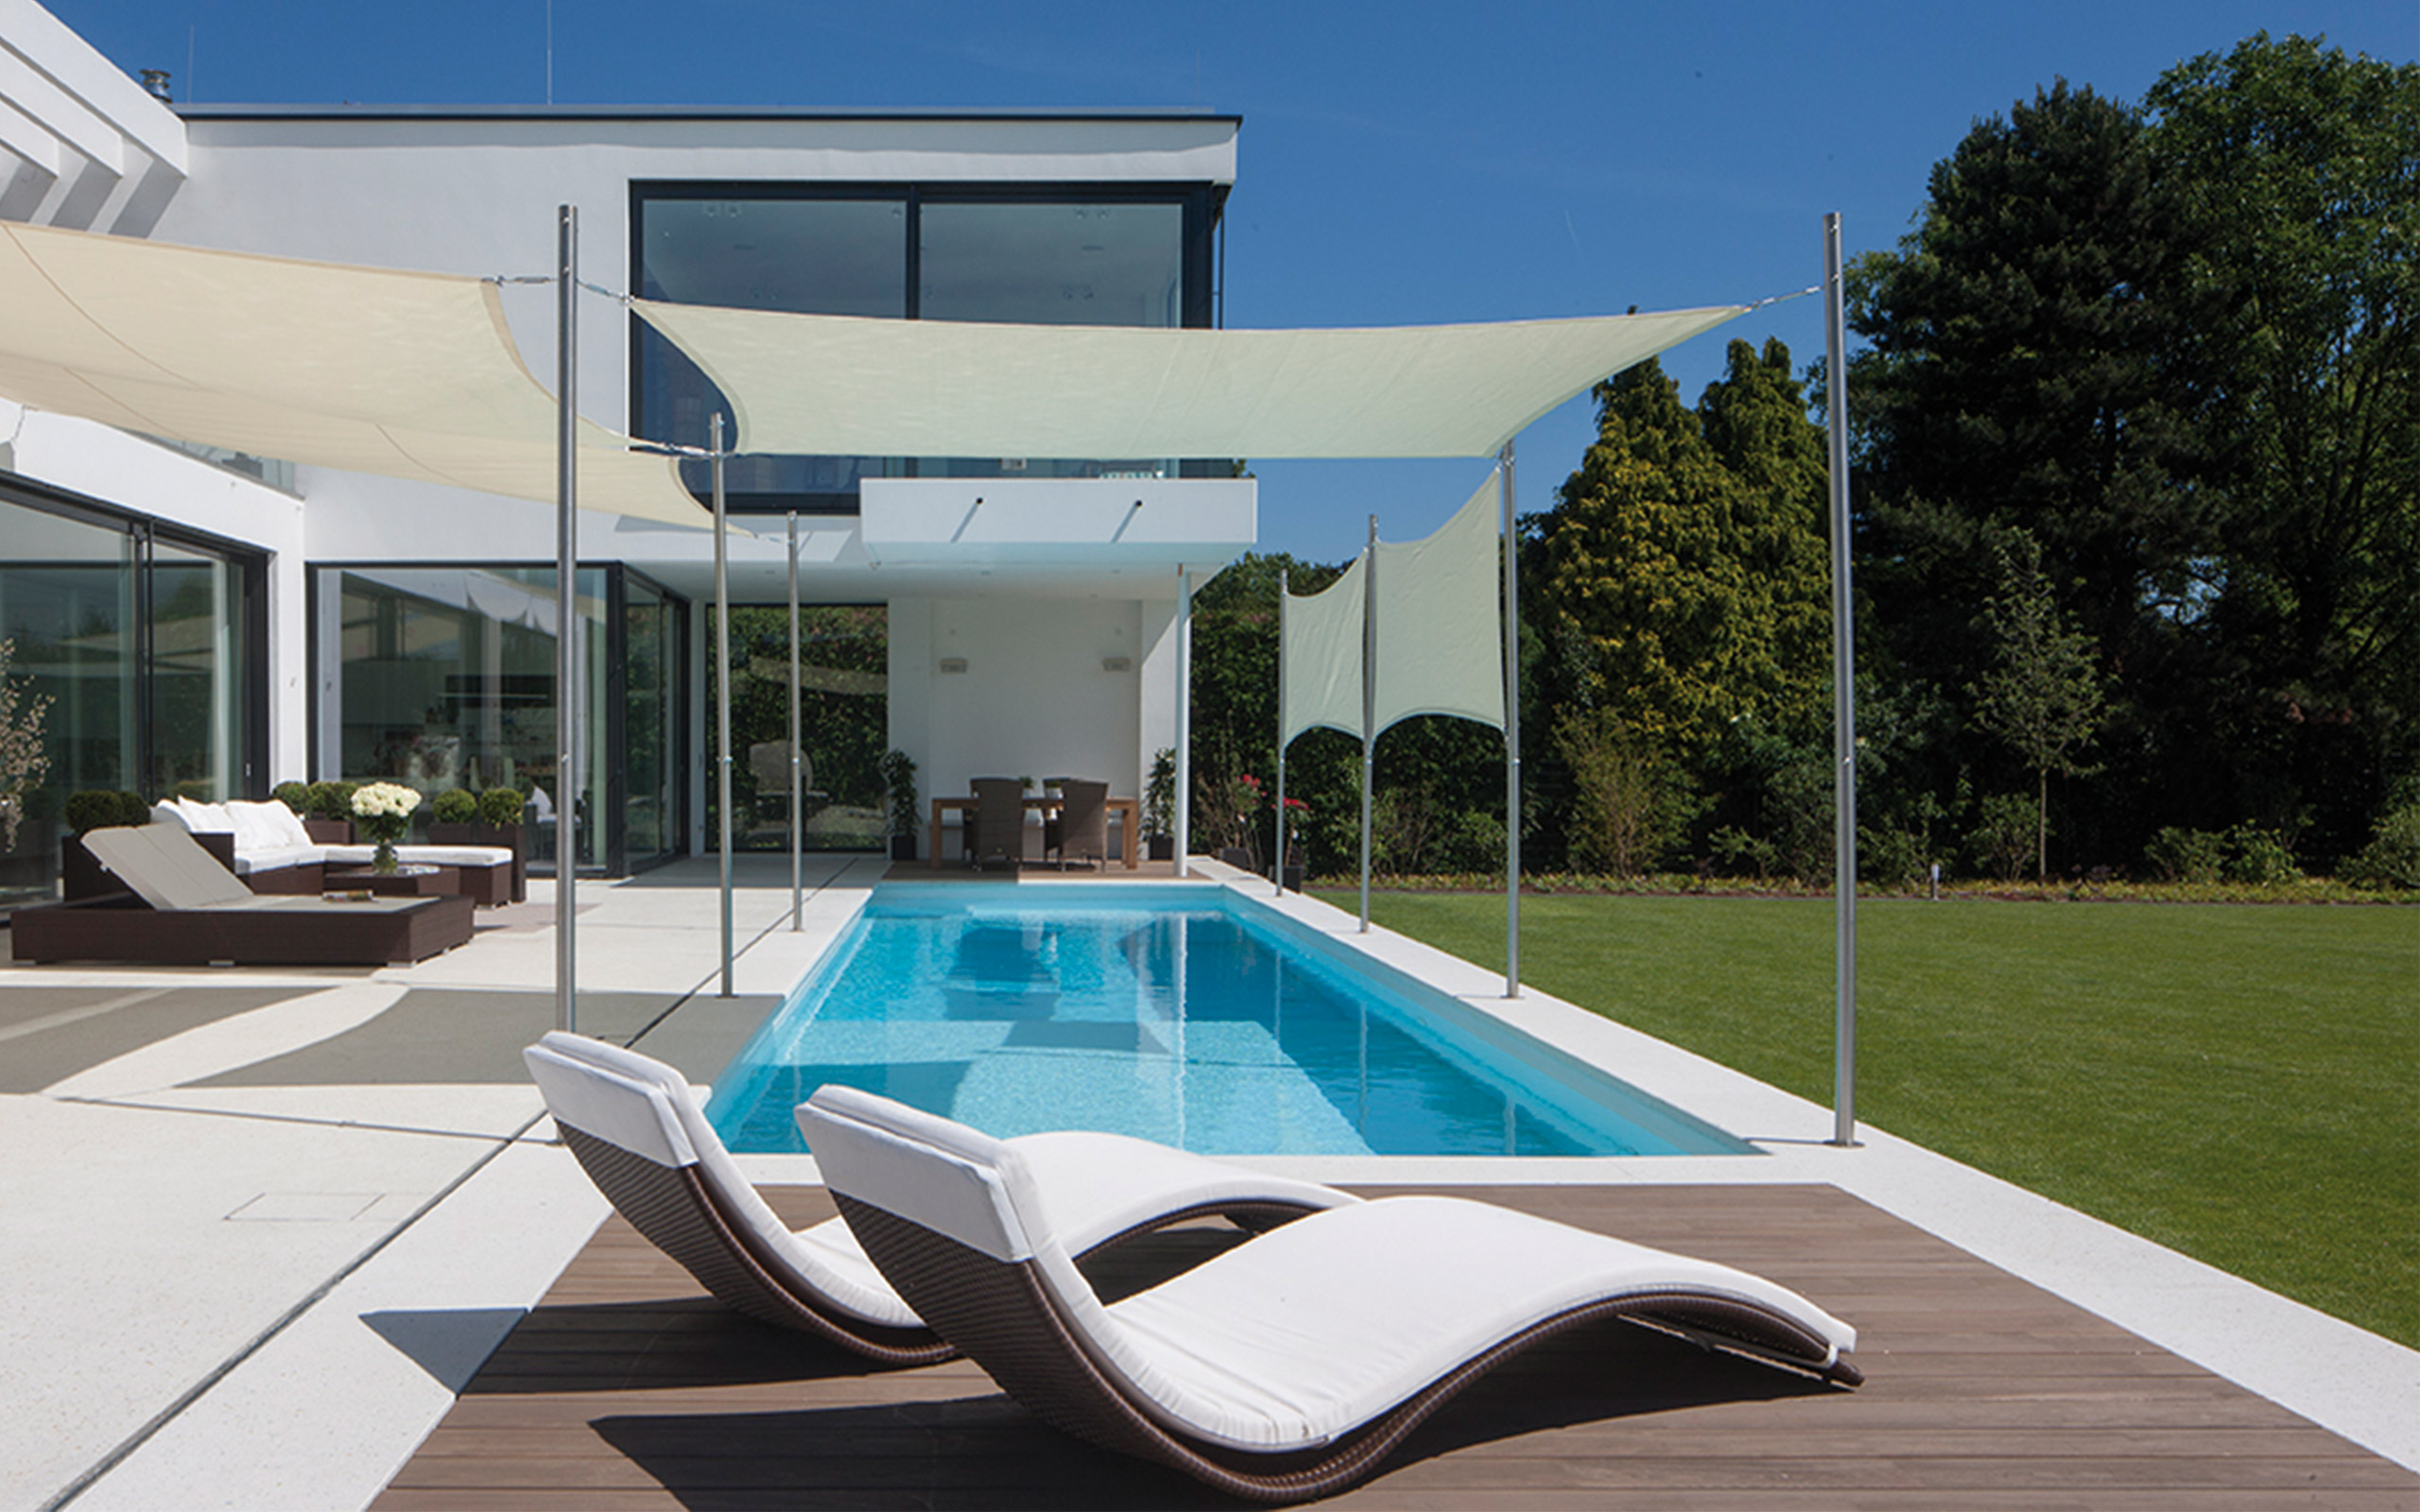 pool mit tiefgang. Black Bedroom Furniture Sets. Home Design Ideas